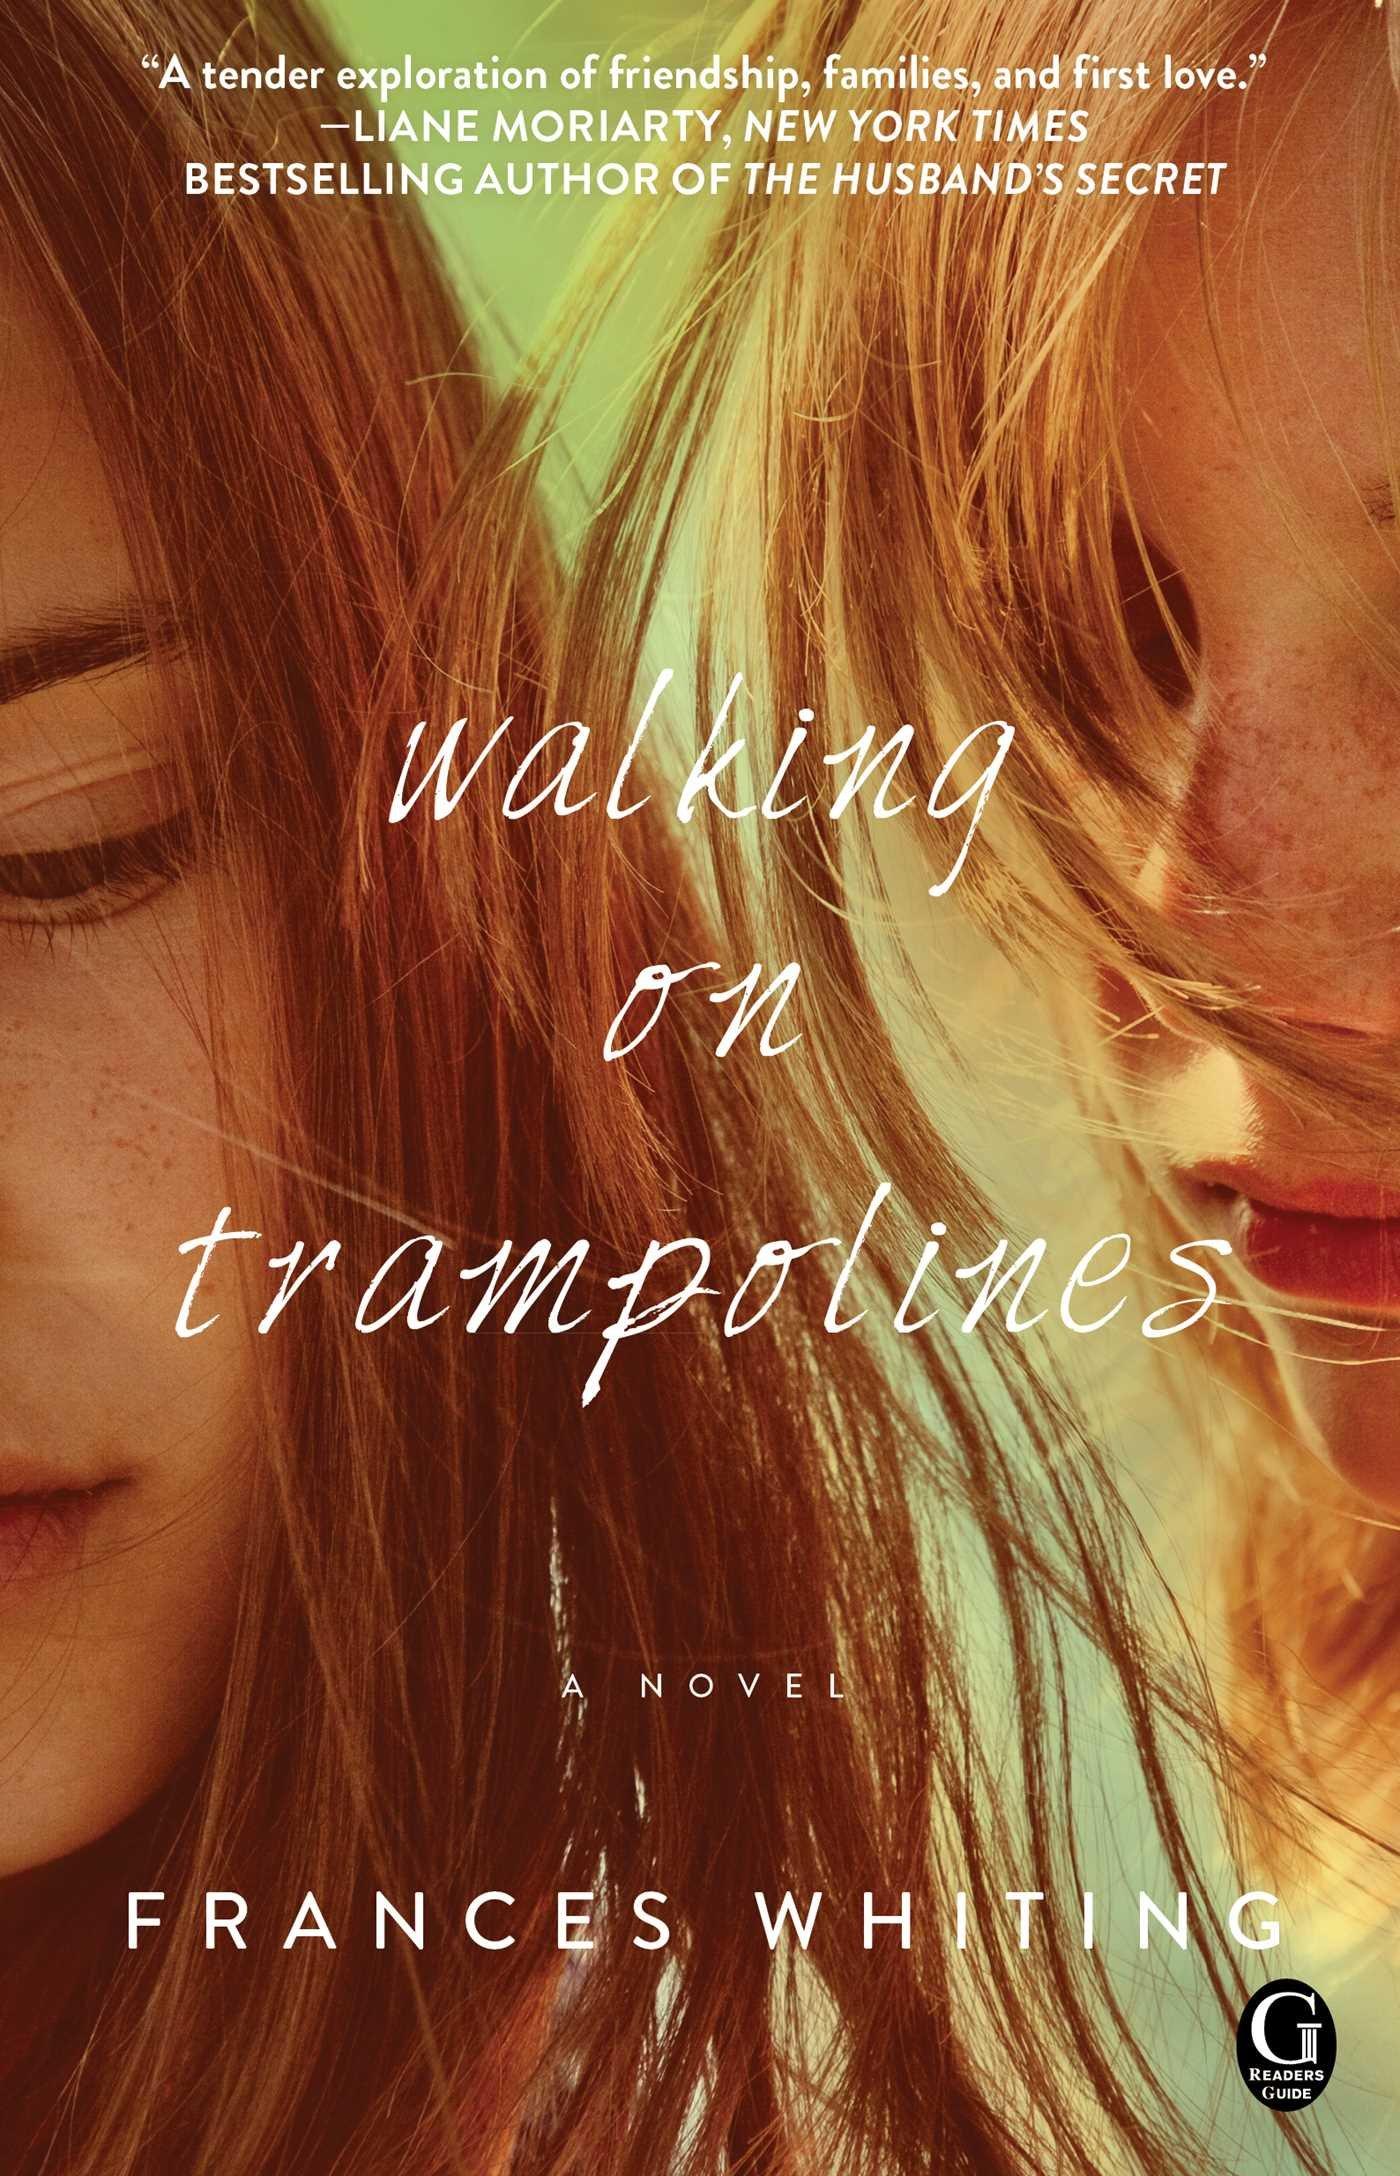 Walking On Trampolines: Frances Whiting: 9781476780016: Amazon: Books